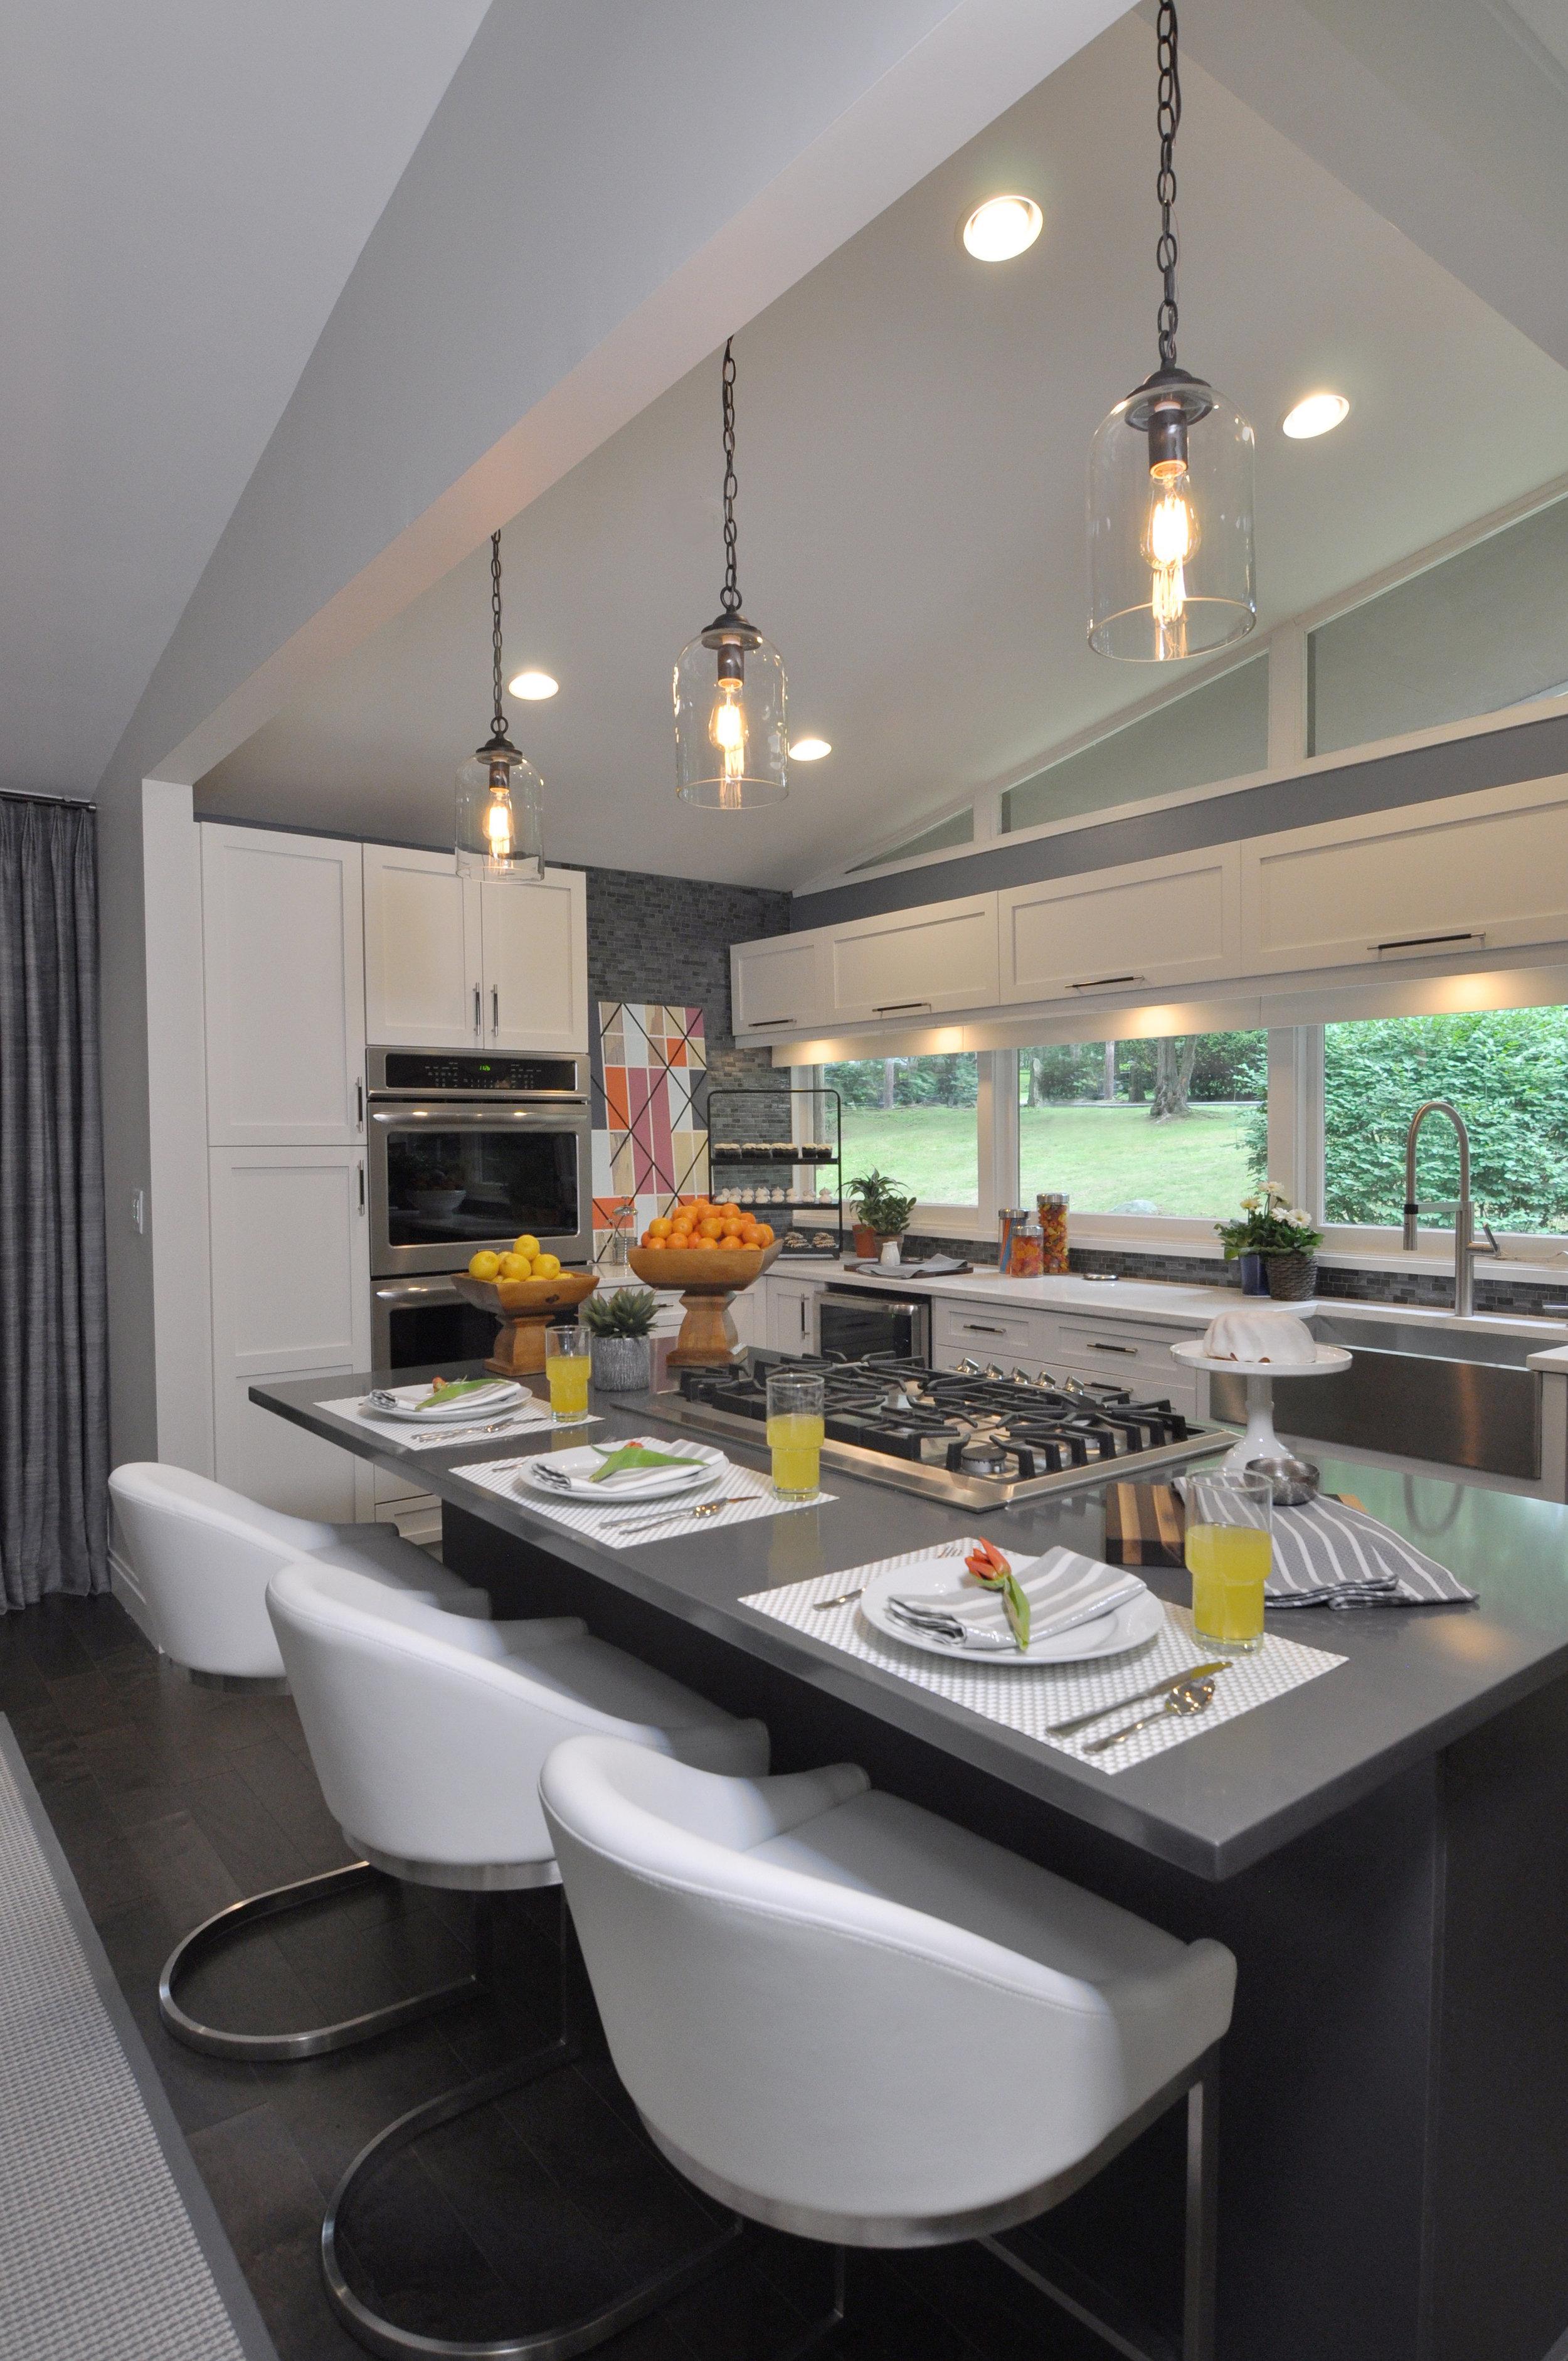 Kim A Mitchell_Design Lead_HGTV_The Property Brothers_Season6_Episode 9_Kitchen_Modern Kitchen_Blue Glass Mosaic Backsplash_Gray Pentel Quartz Island_Pental Quartz Countertop_White Cabinetry_2017.jpg